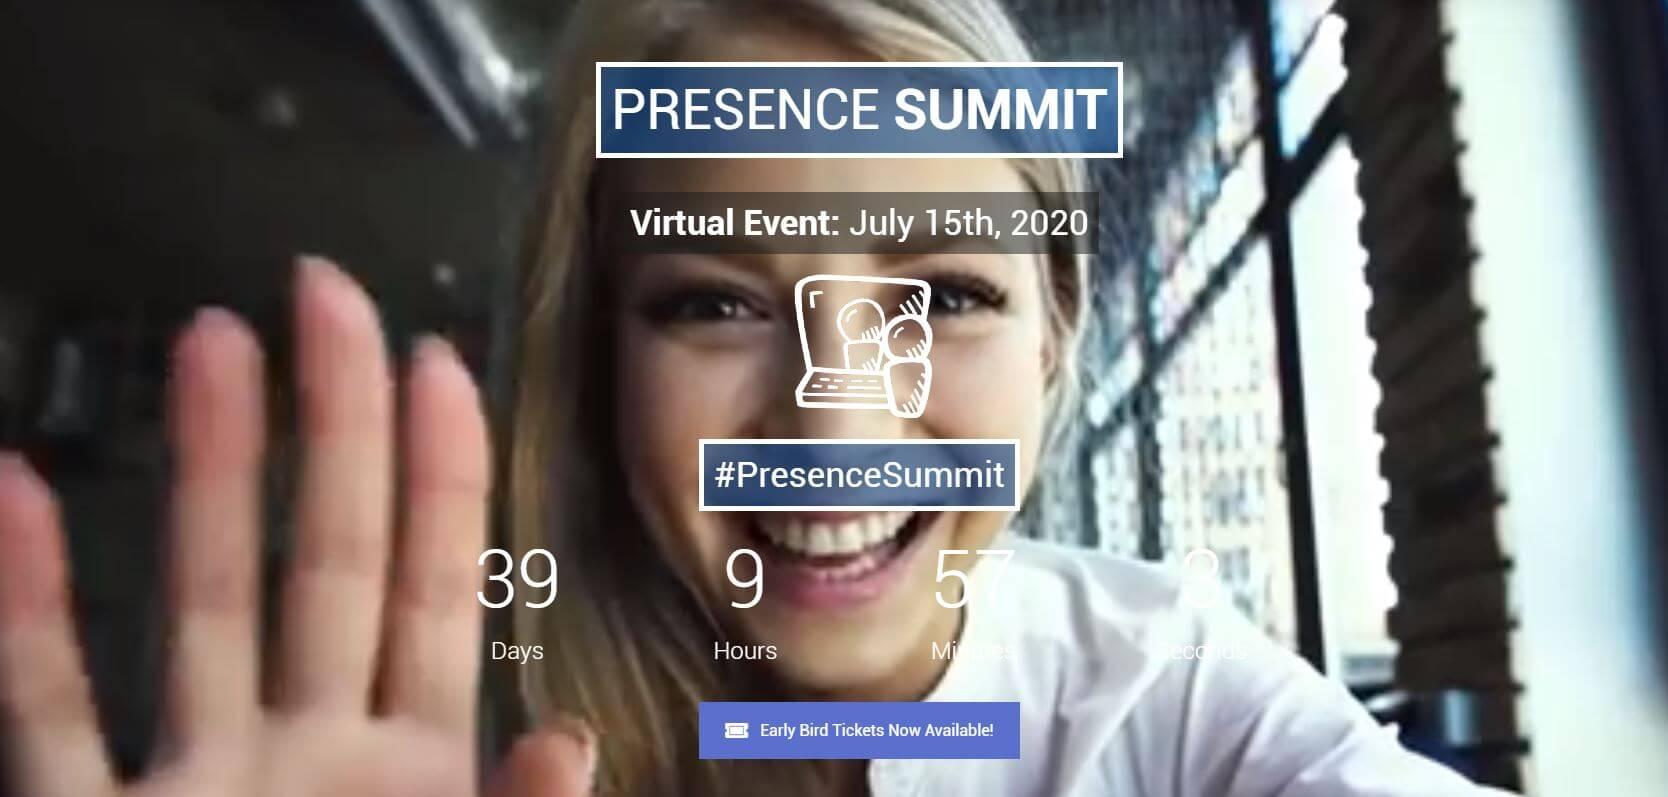 Presence Summit